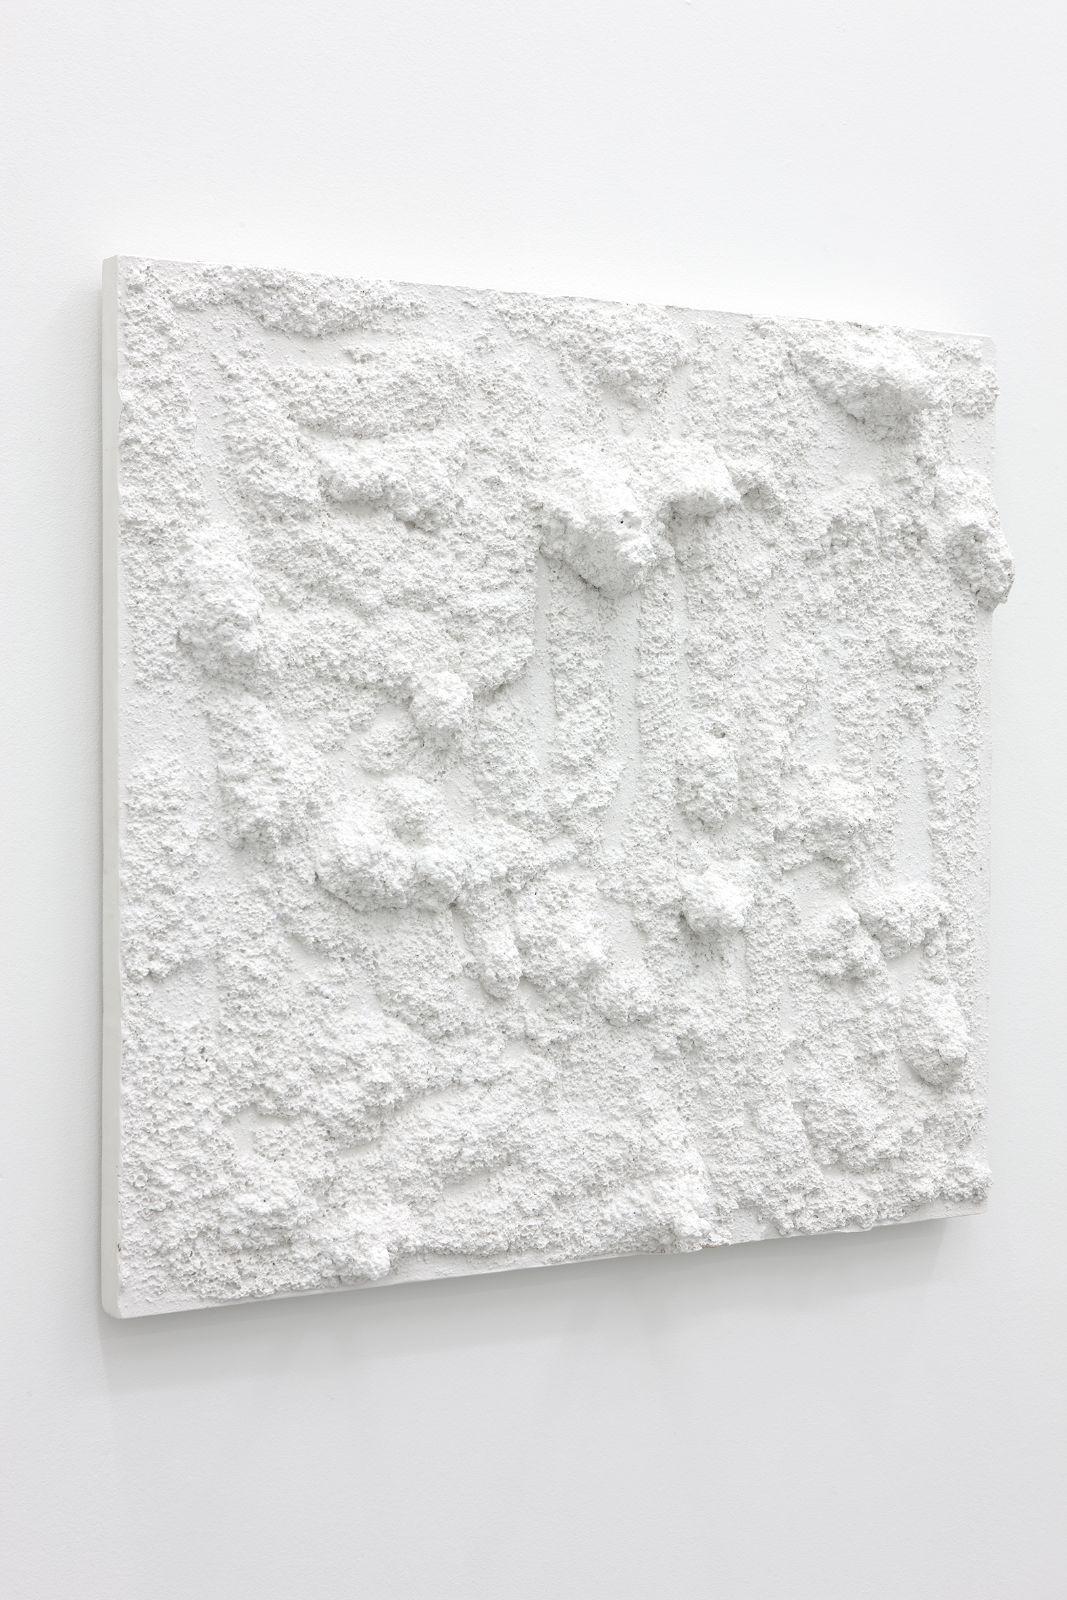 Untitled, 2012, plaster, 75 x 80 x 11,5 cm